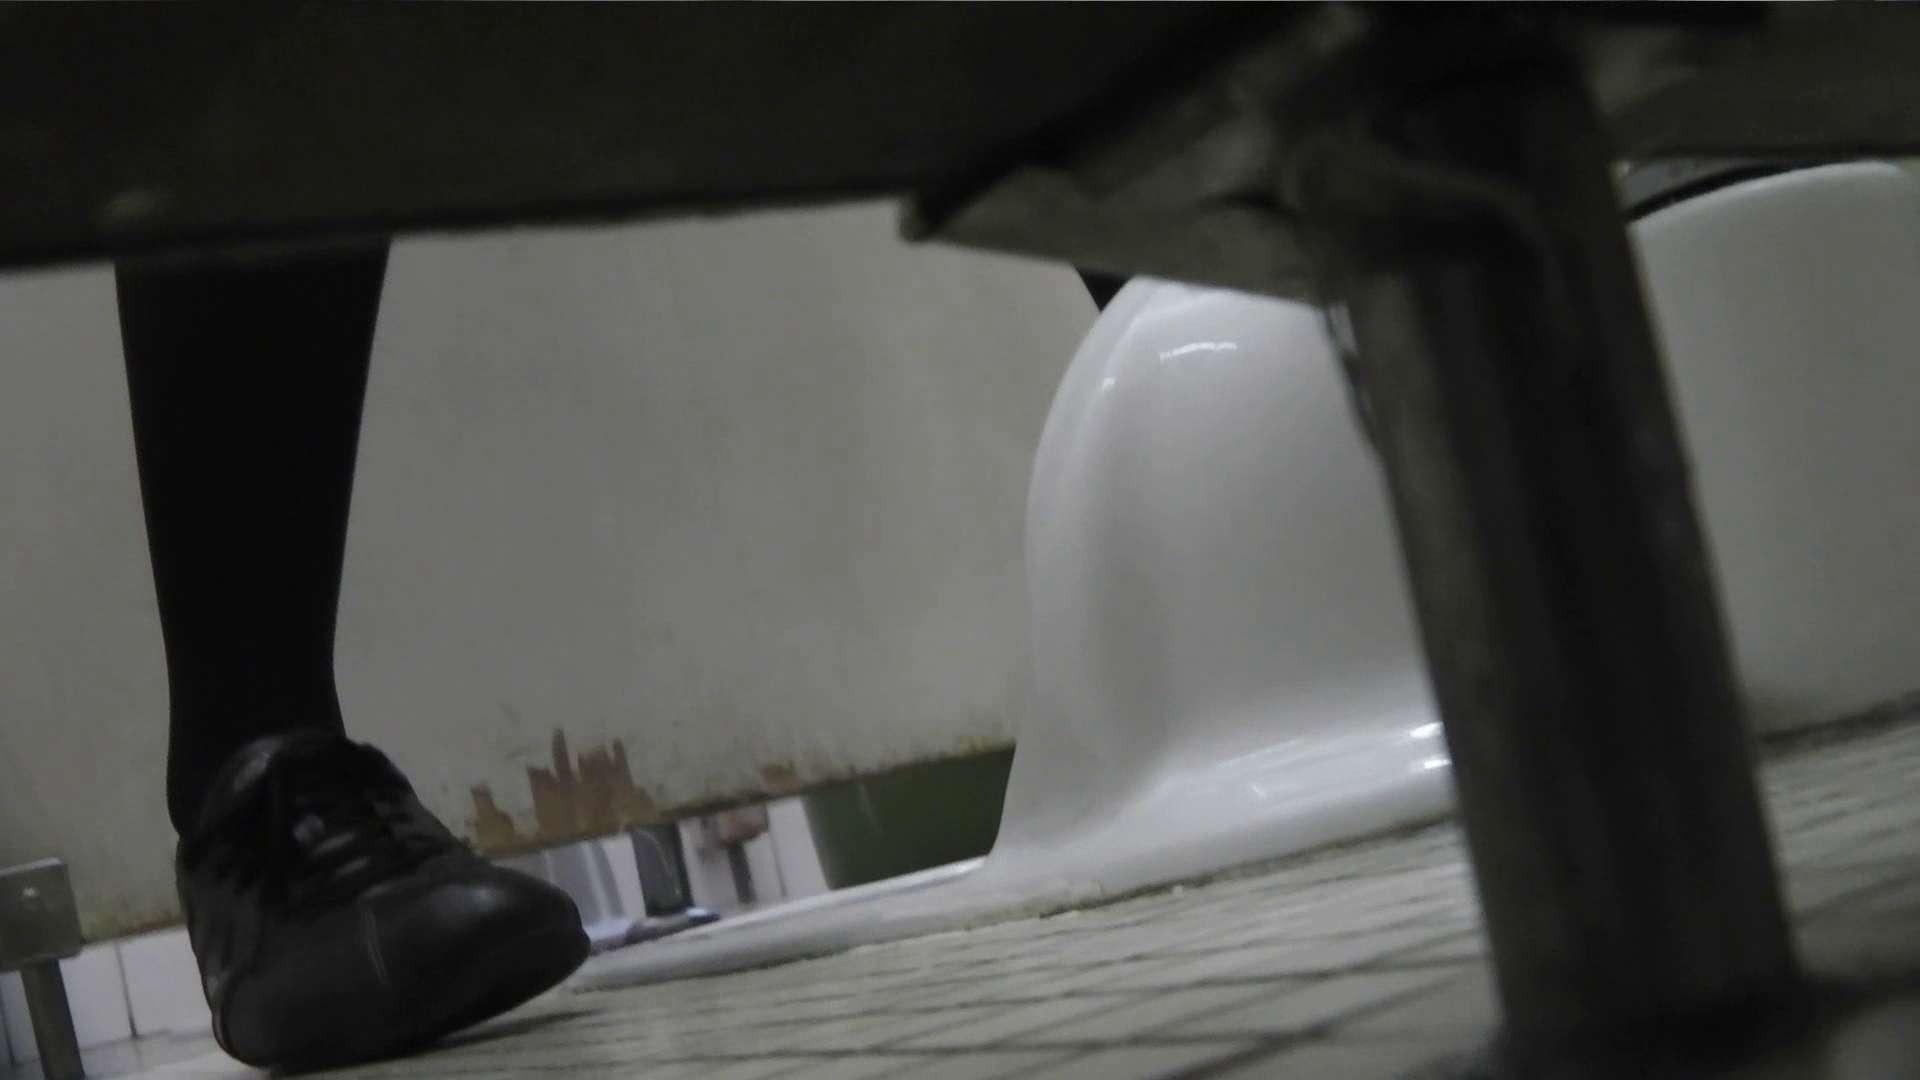 vol.06 命がけ潜伏洗面所! 茶髪タン、ハァハァ 前編 プライベート オマンコ動画キャプチャ 74枚 47